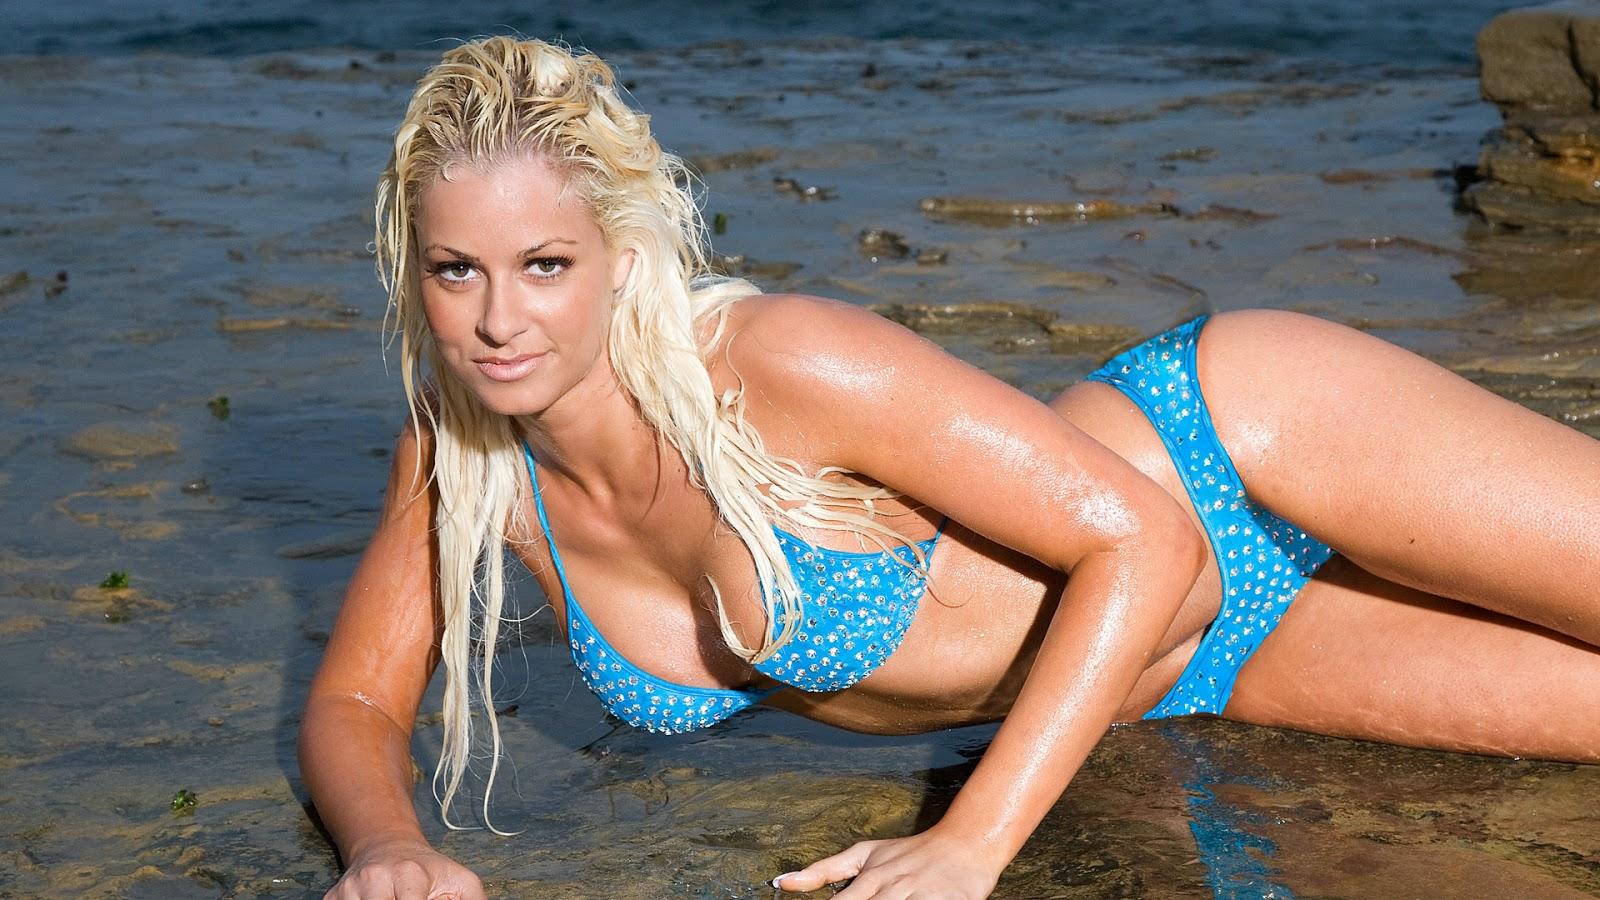 Maryse Ouellet Measurements: THE WOMEN OF WWE DIVAS! MARYSE (HOT!!) VS TRISH STRATUS